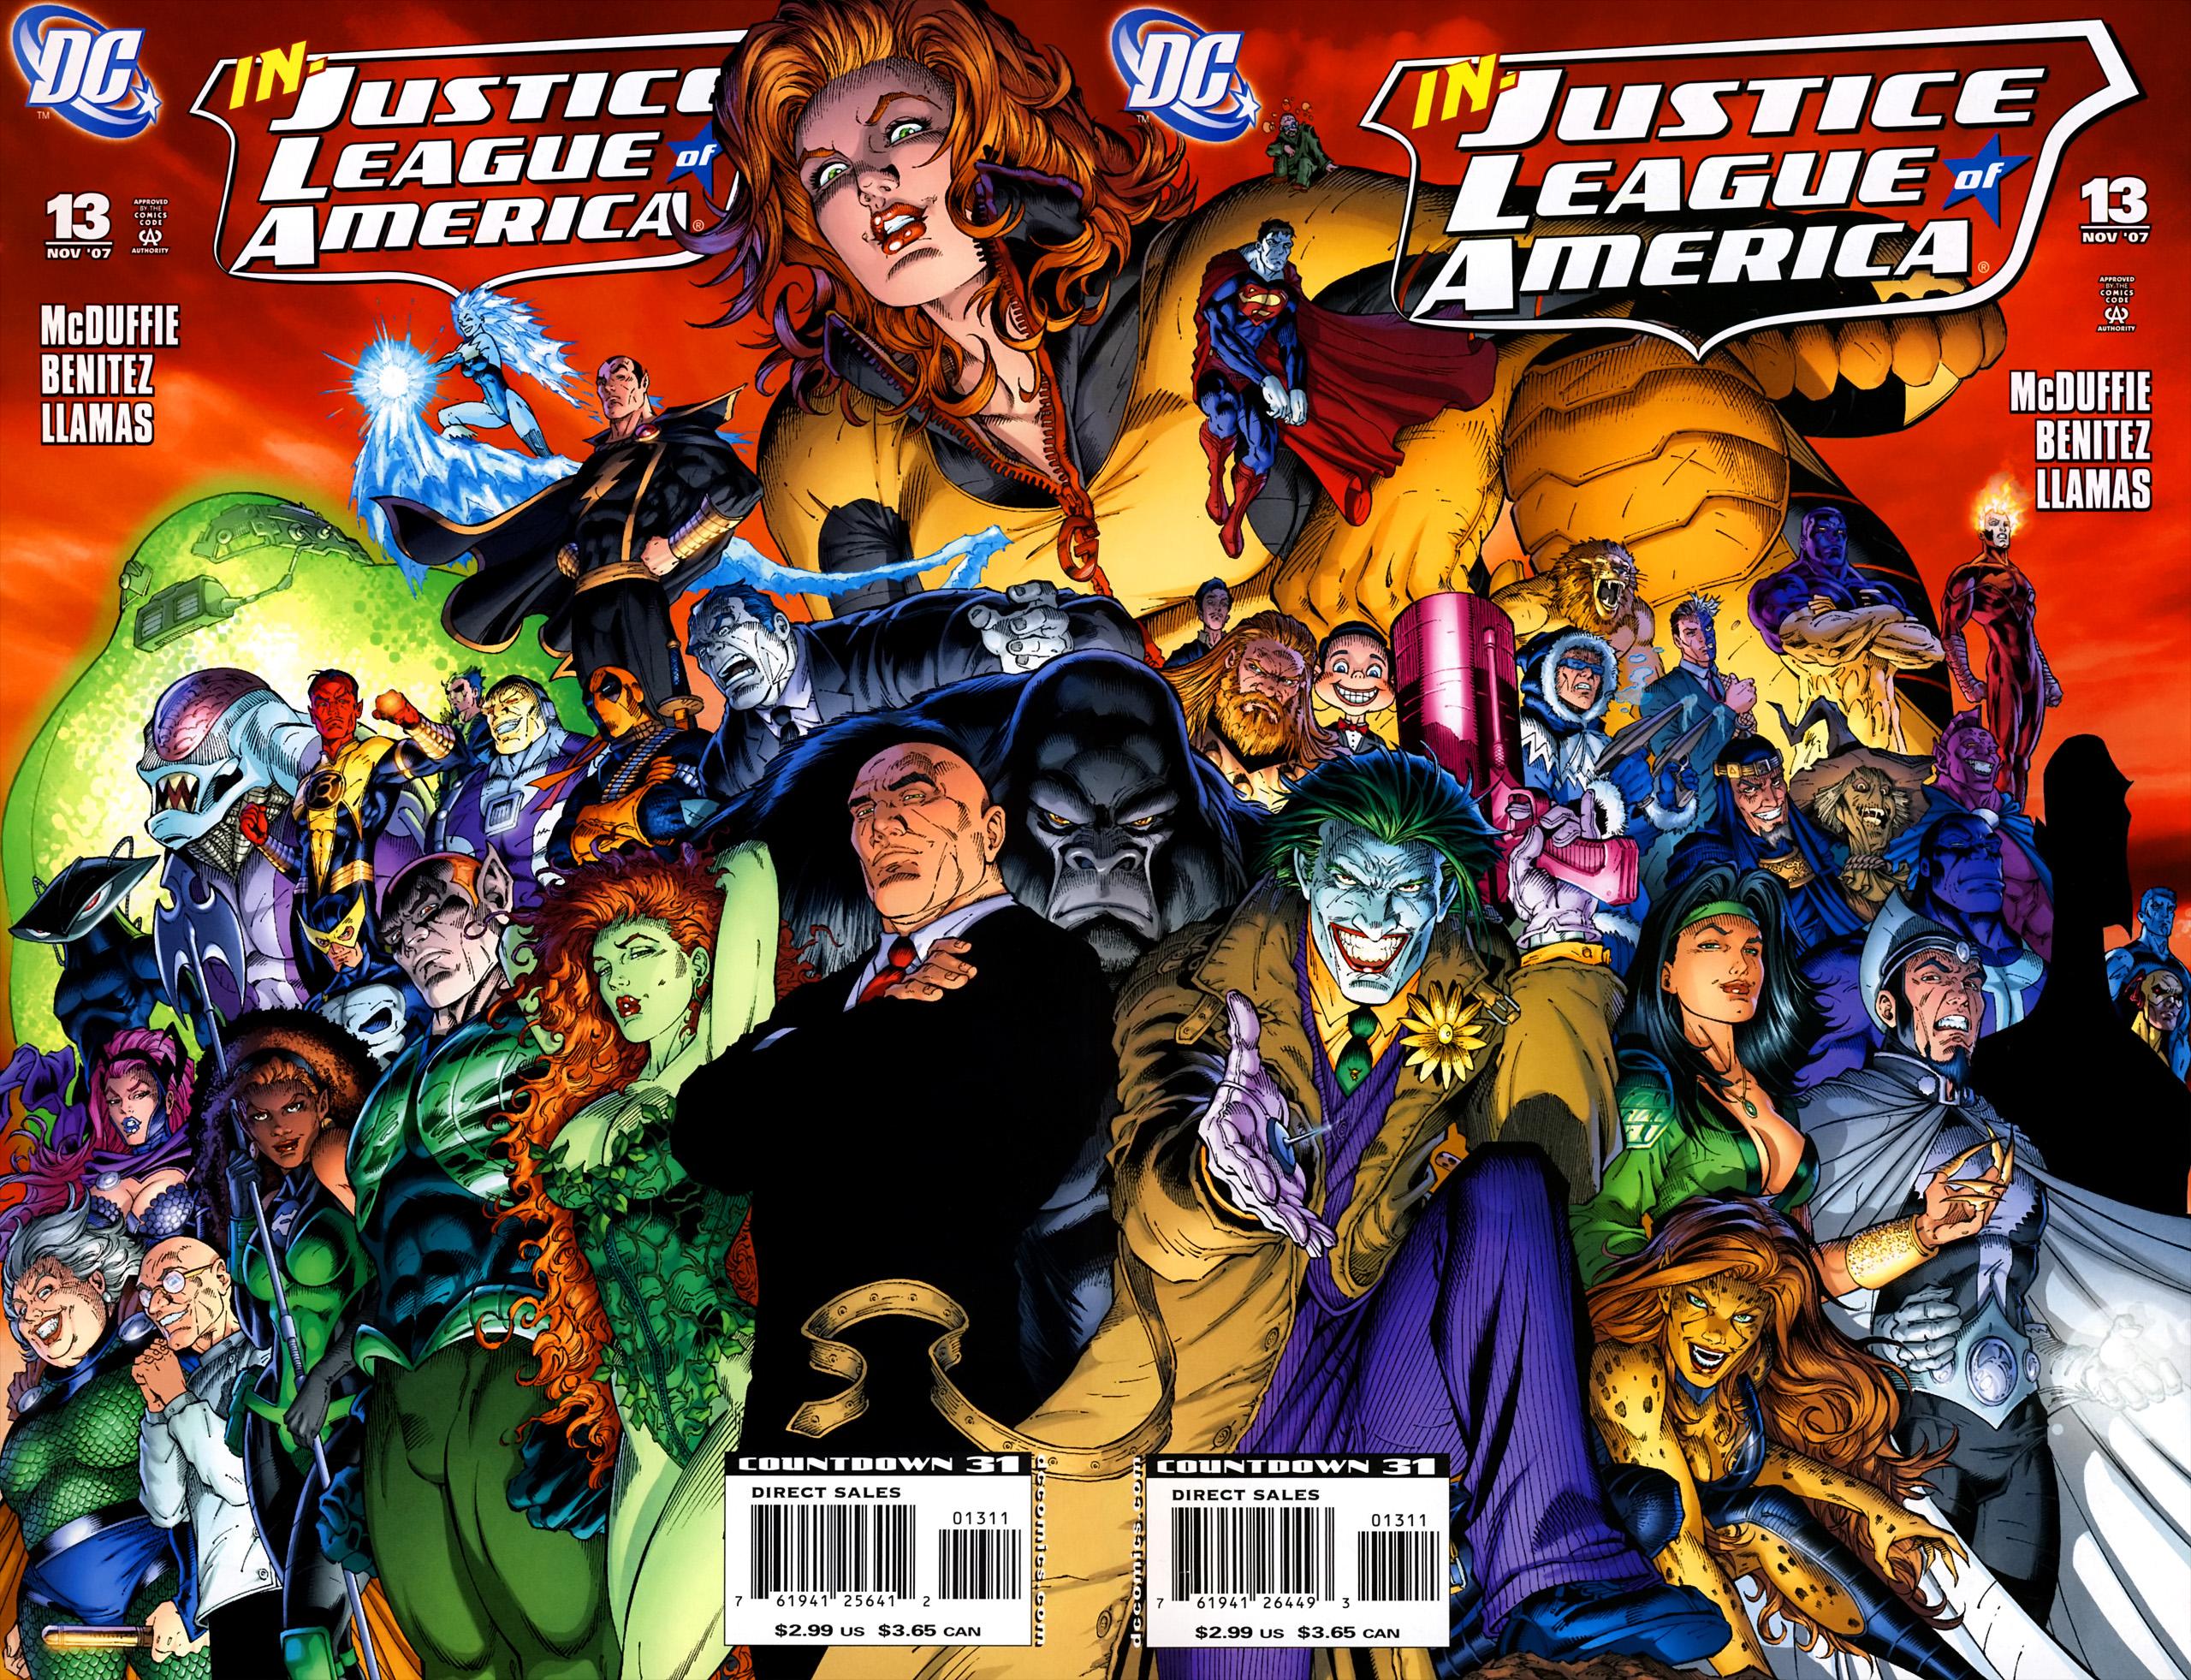 Justice League of America: Injustice League Unlimited